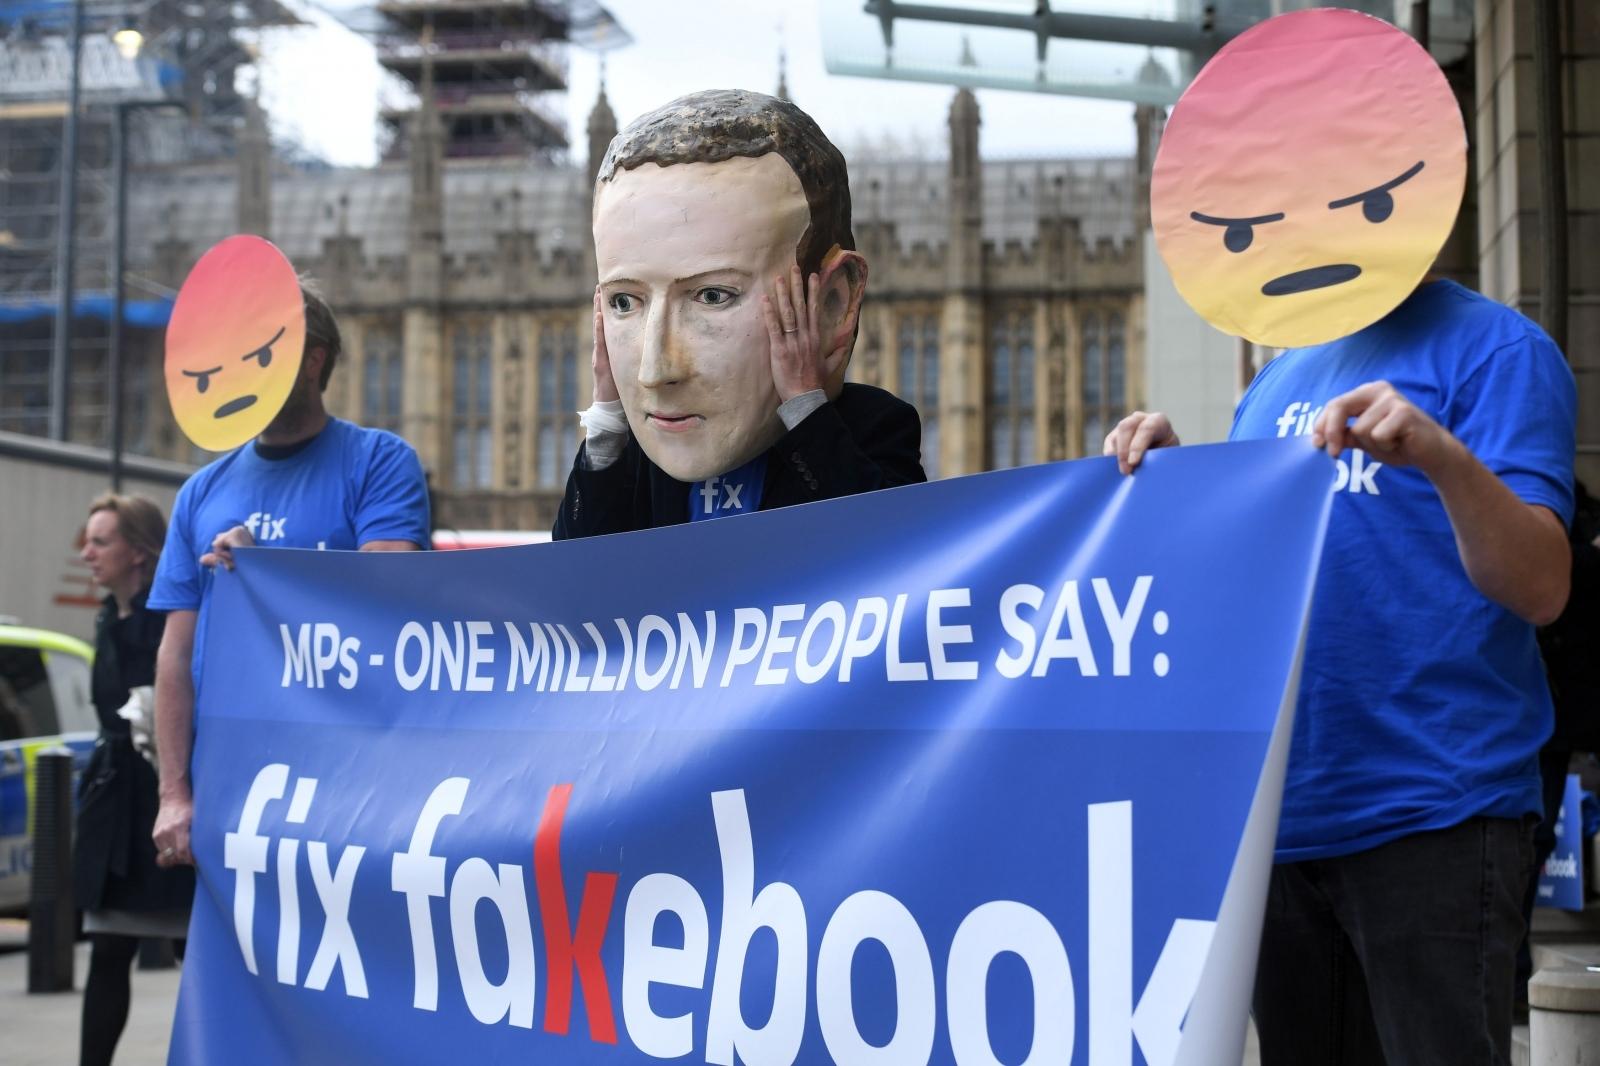 Facebook - protesti v Bruslju Vir:Pixell